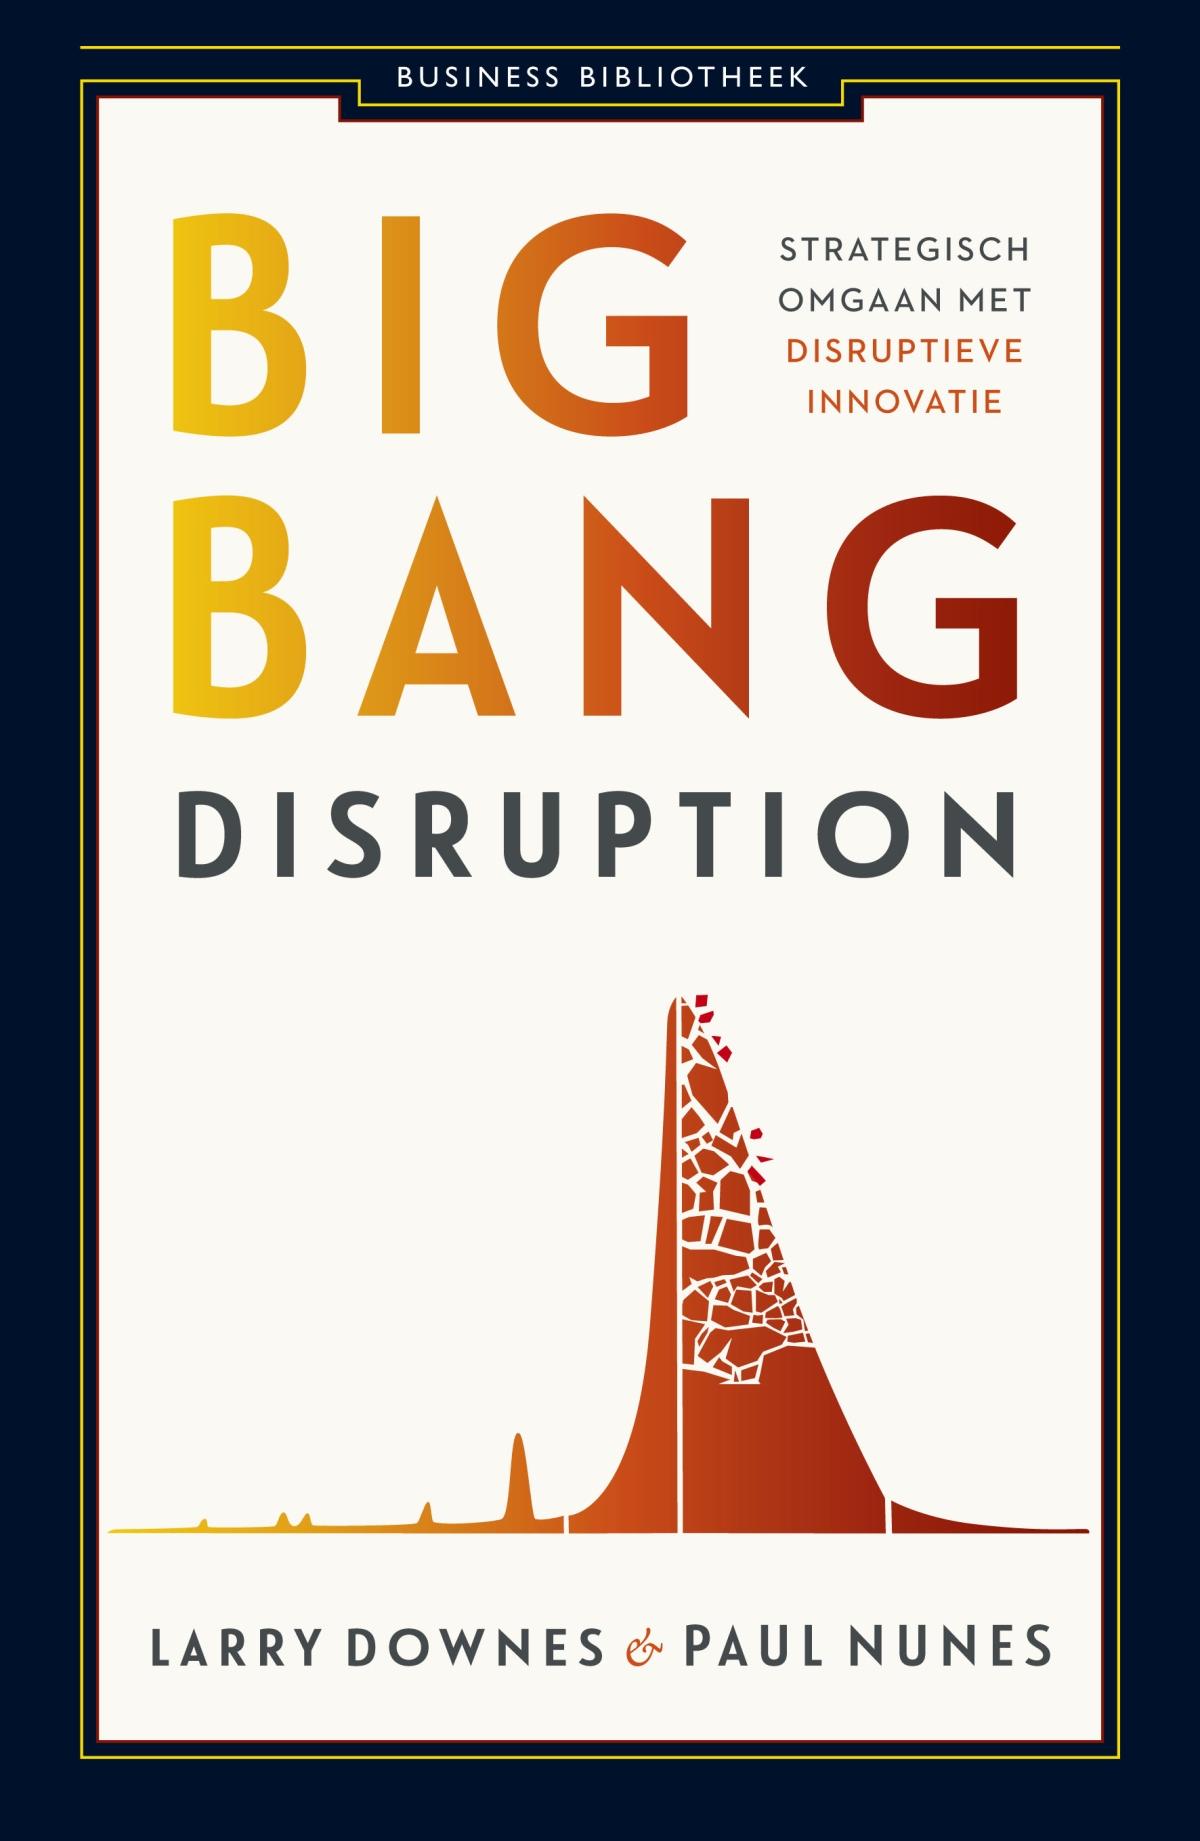 Big bang disruption - Larry DownesPaul Nunes